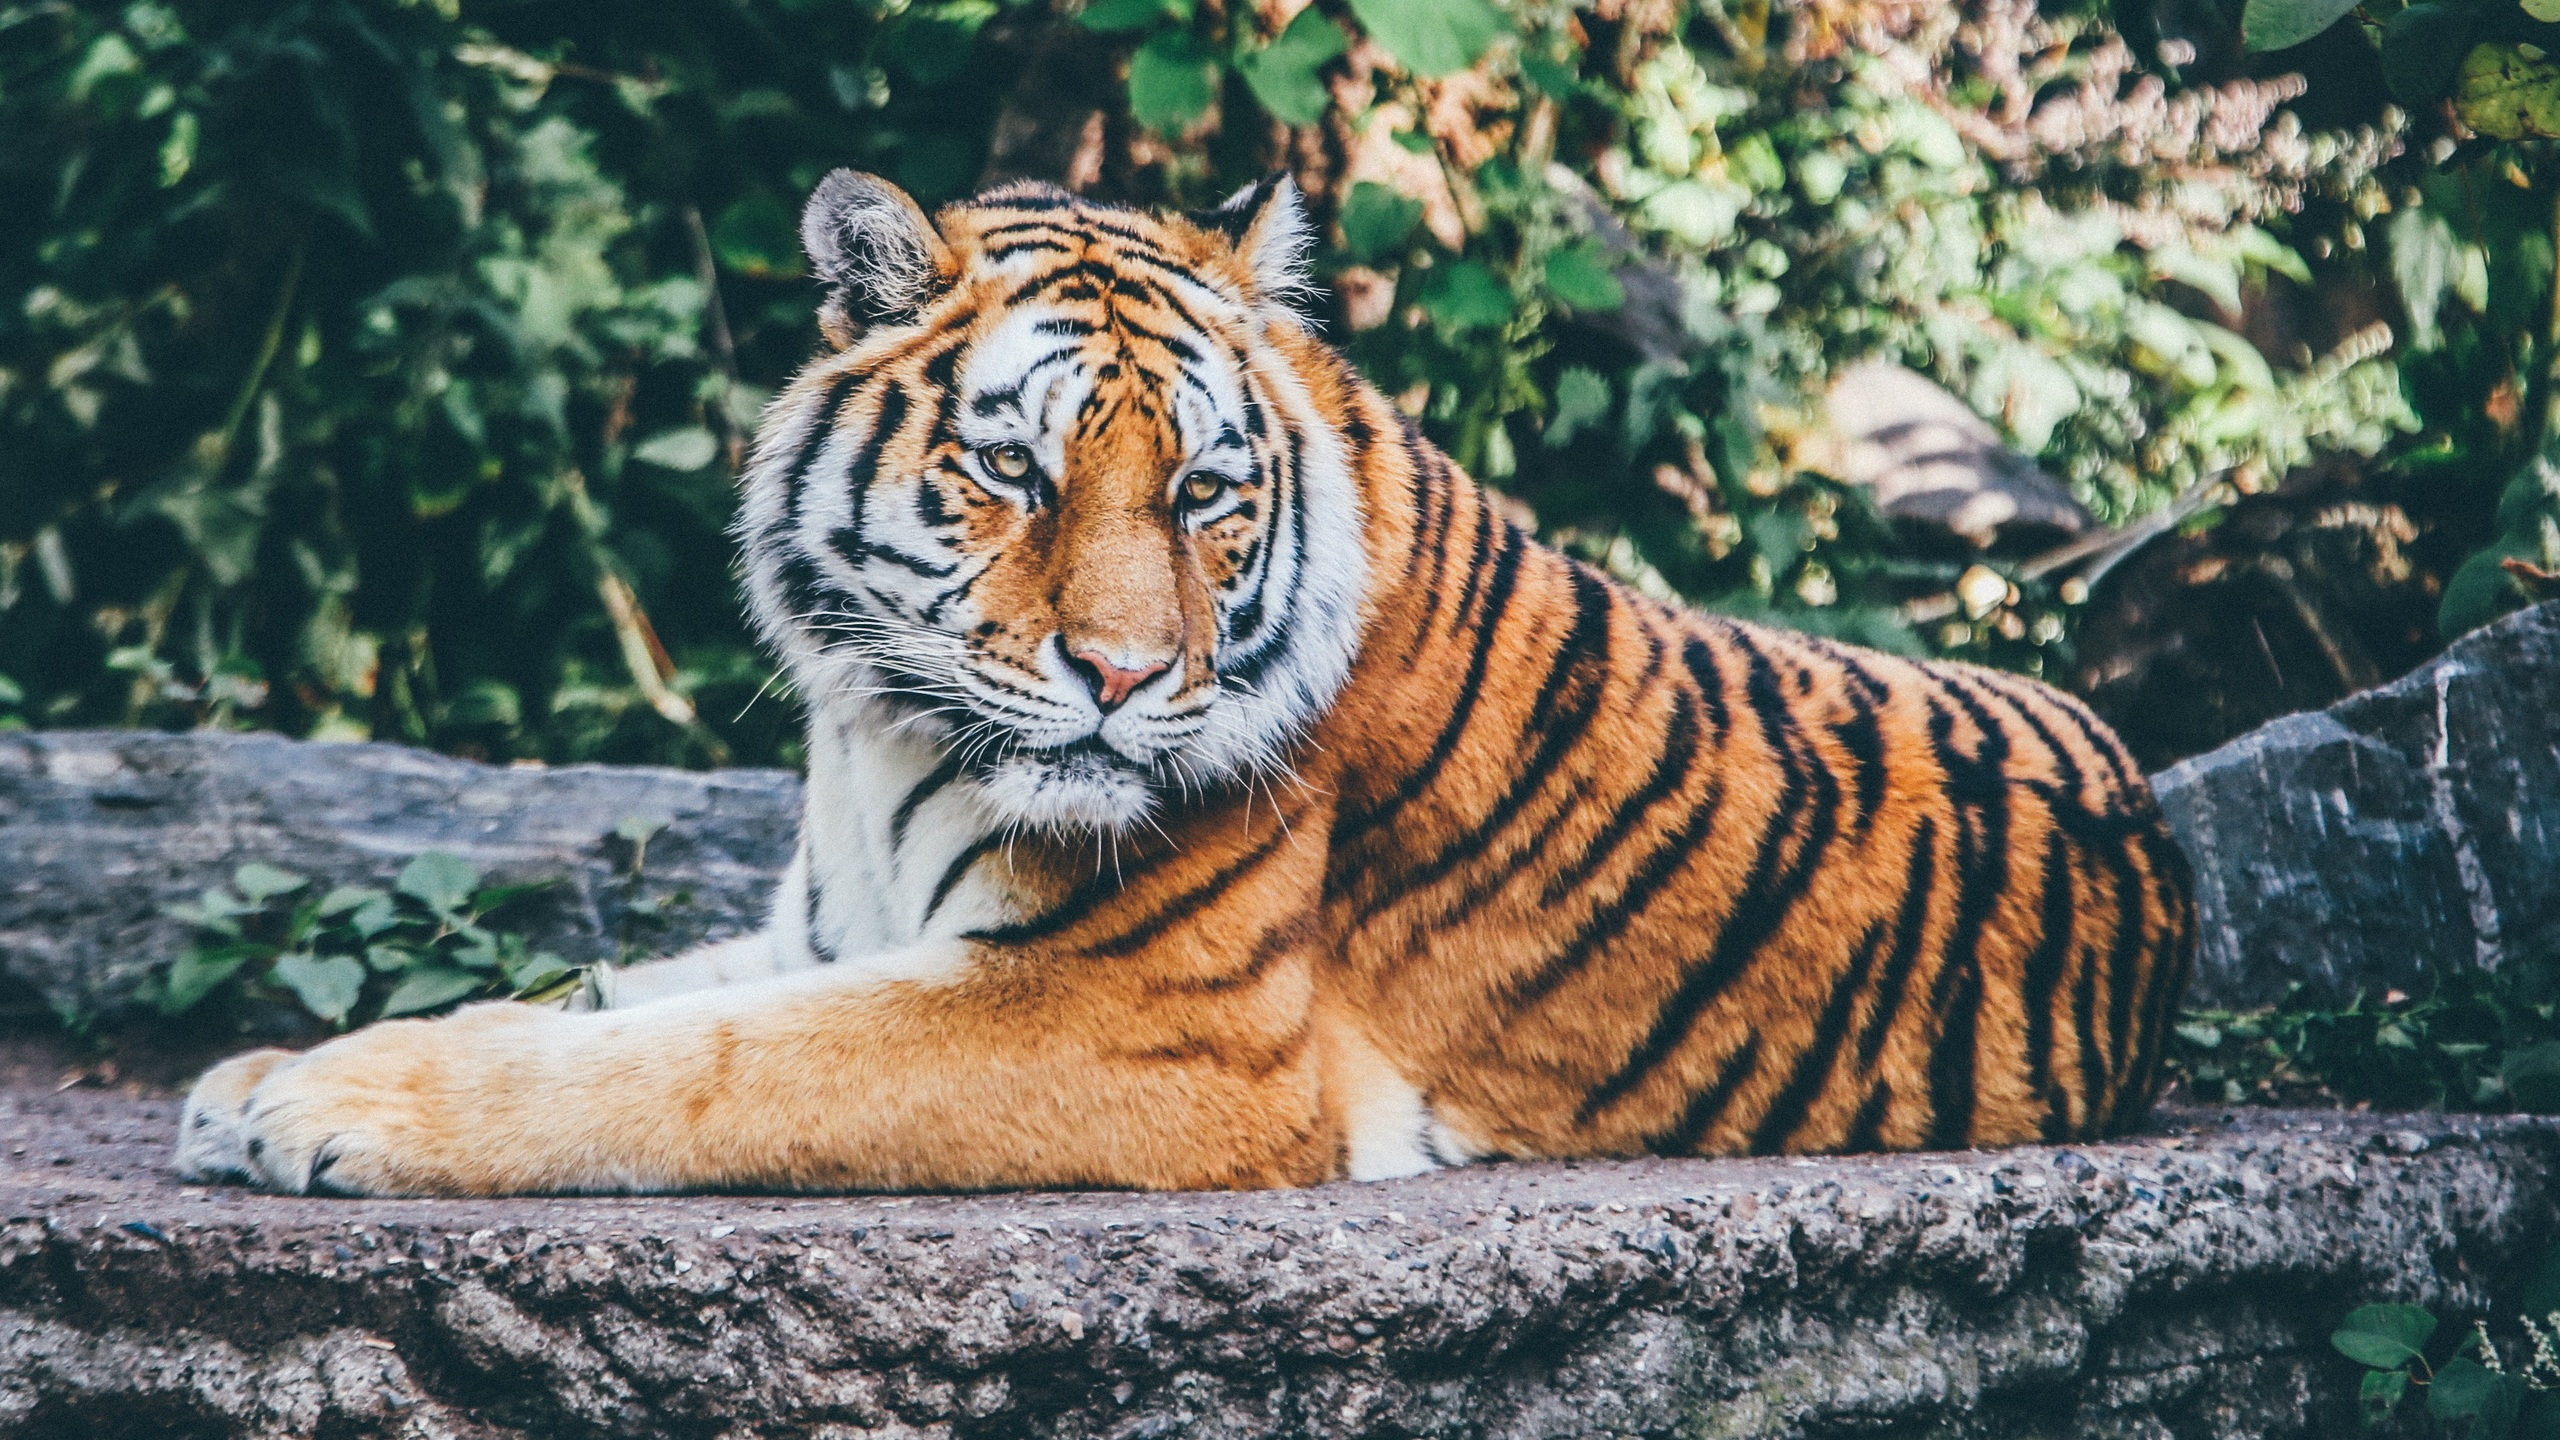 2560x1440 safari tiger 4k 1440p resolution hd 4k wallpapers, images